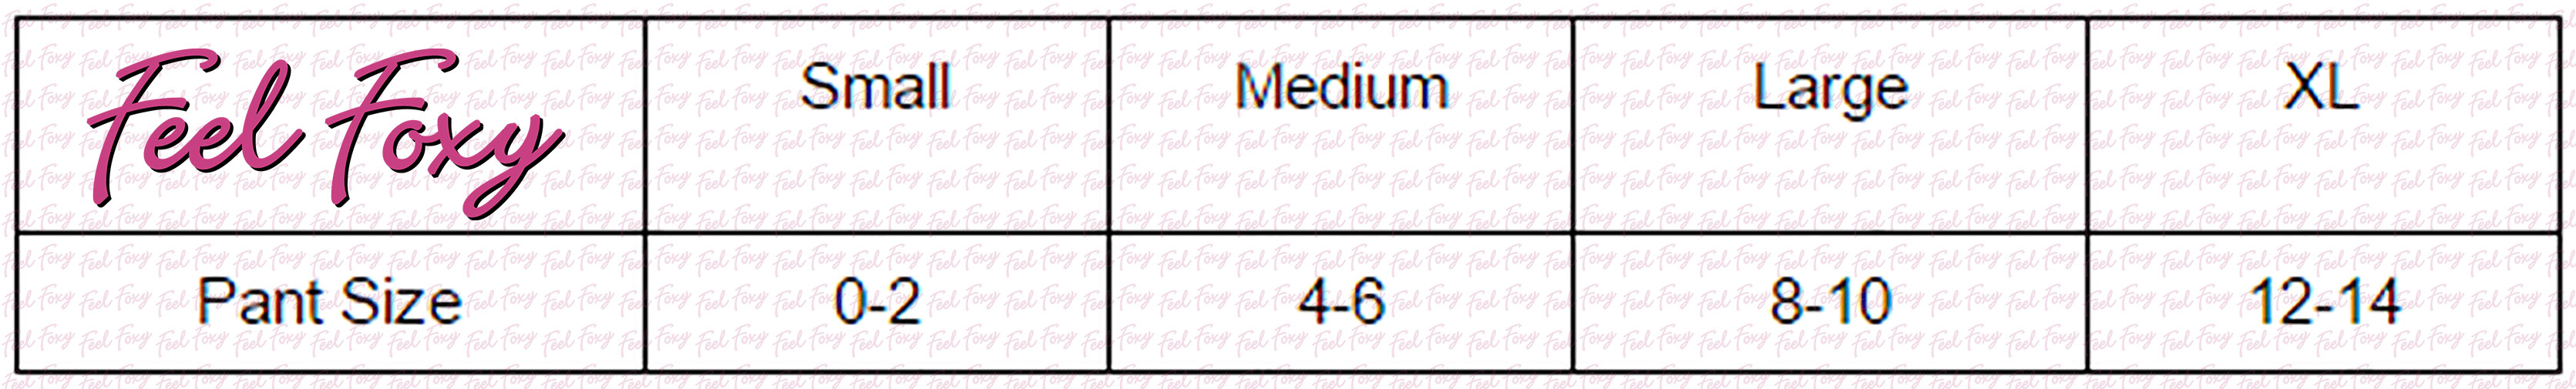 sticky-buns-chart.jpg